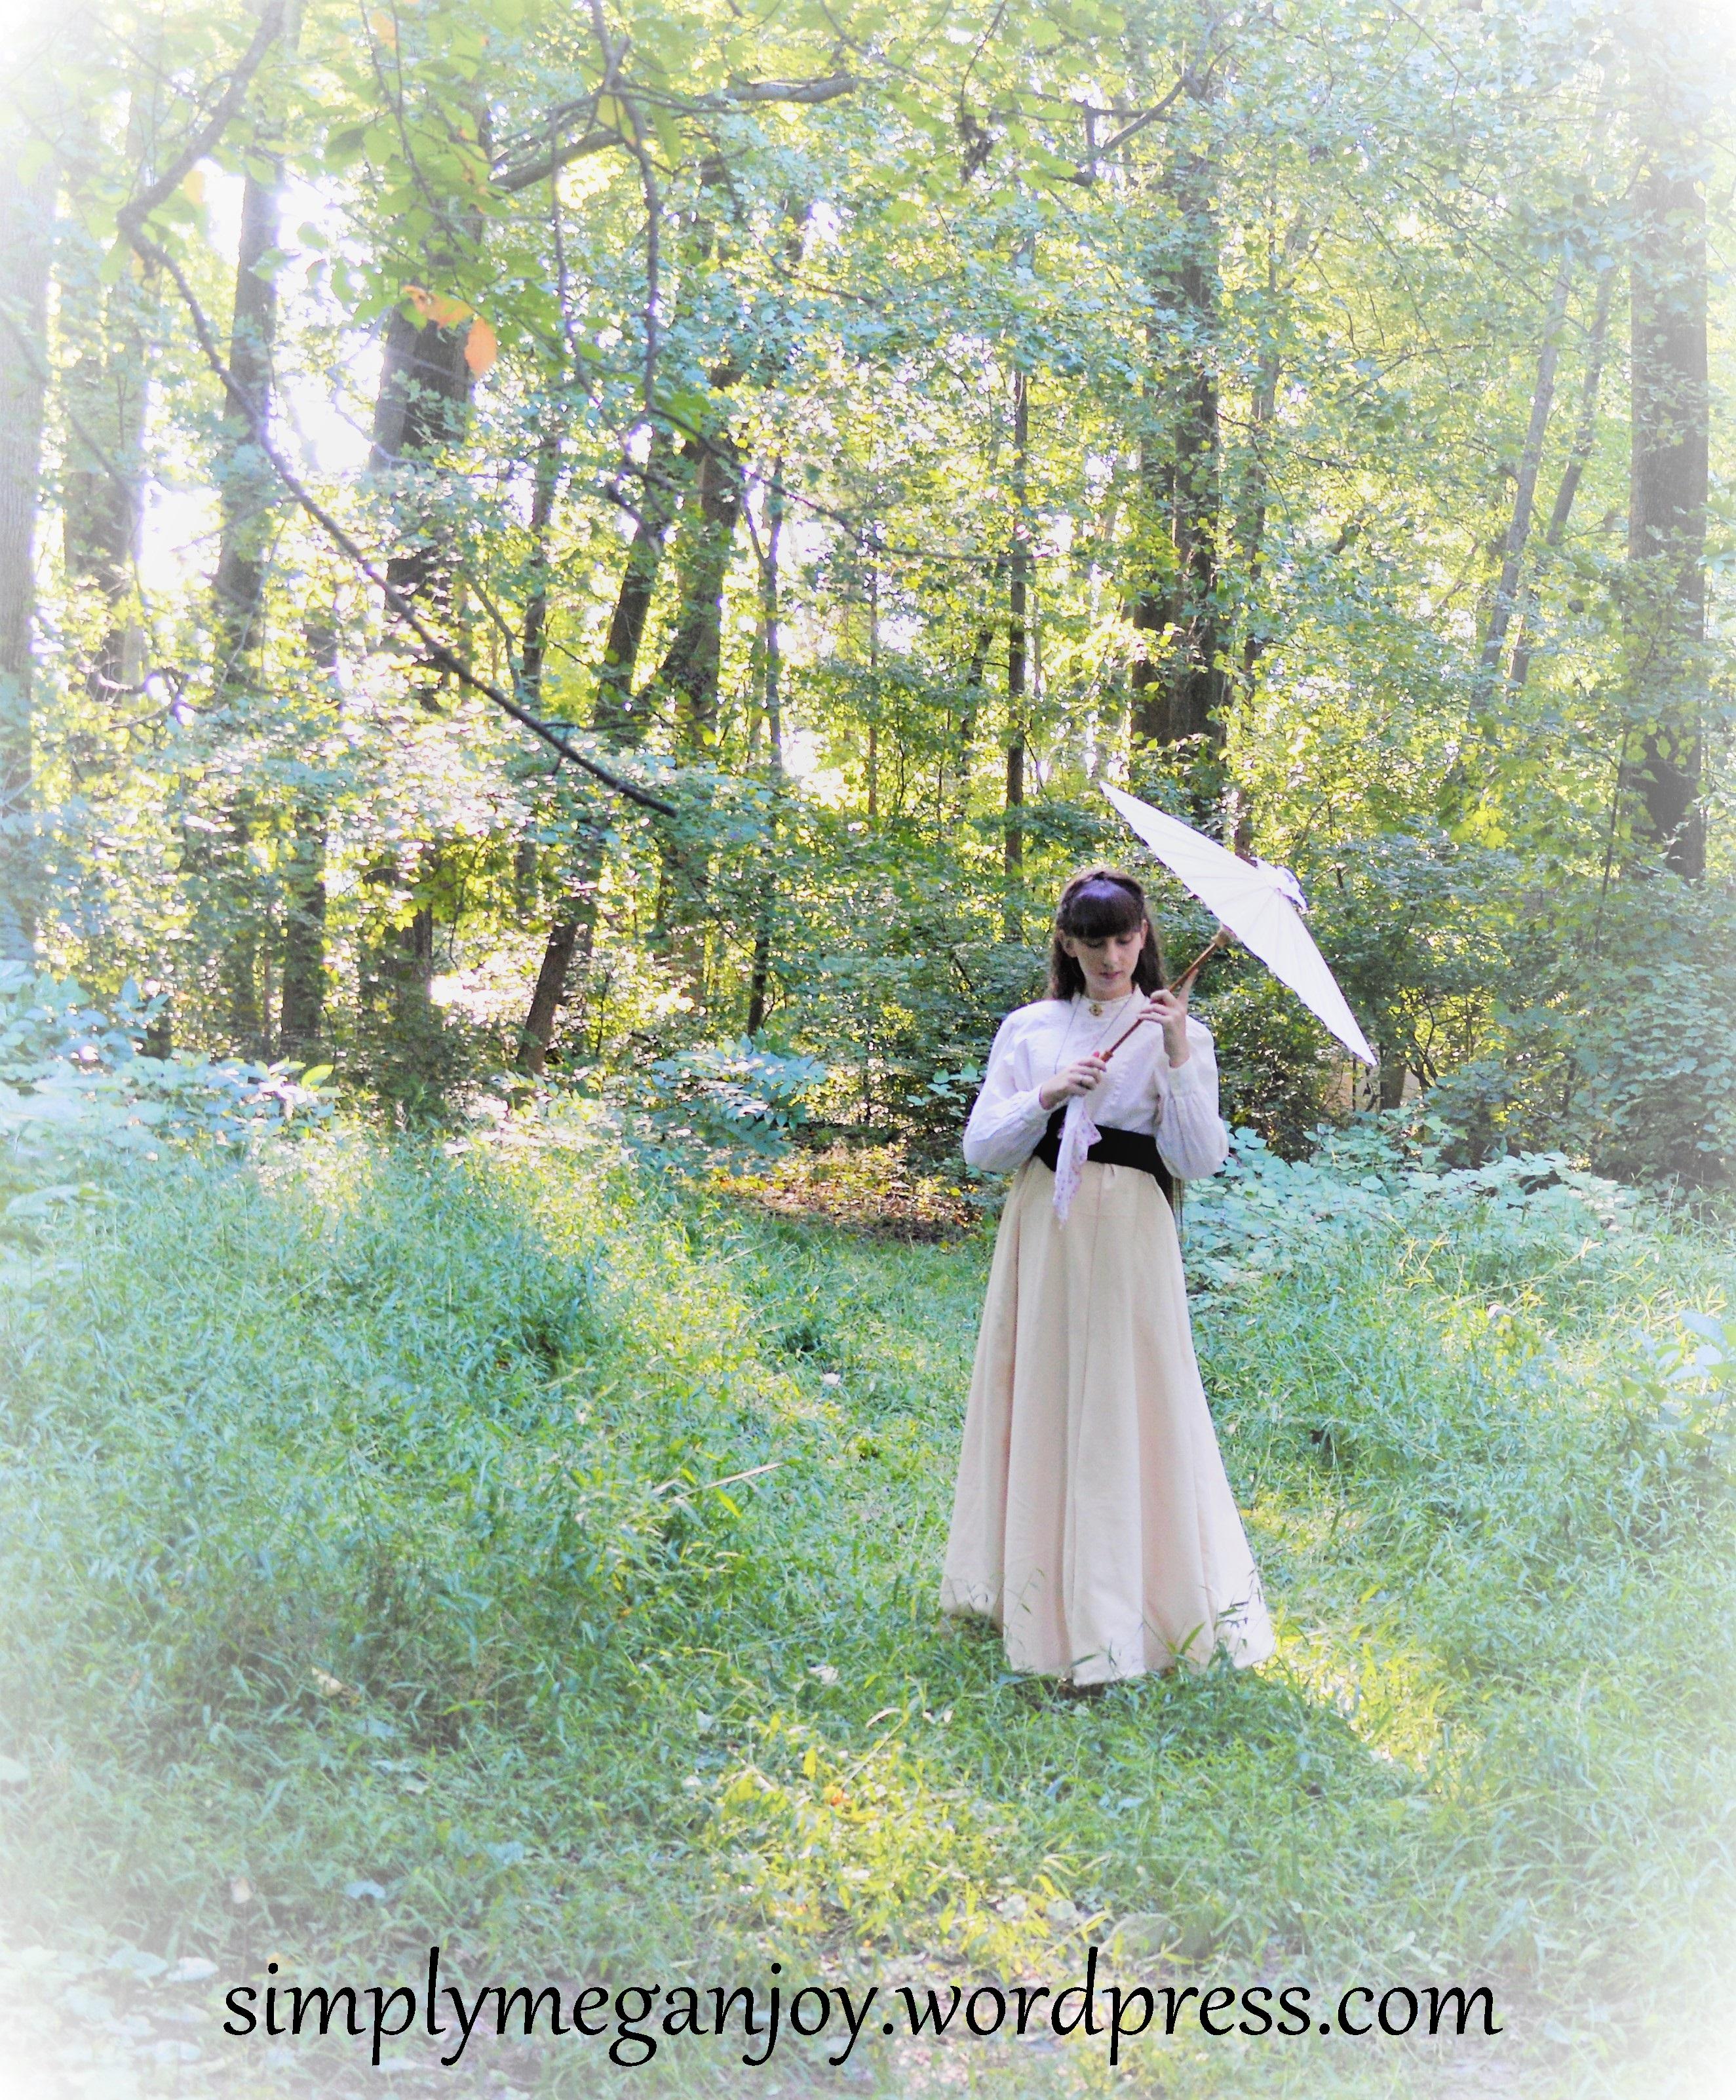 Diana of Avonlea - Victorian Outfit - simplymeganjoy.wordpress.com 2